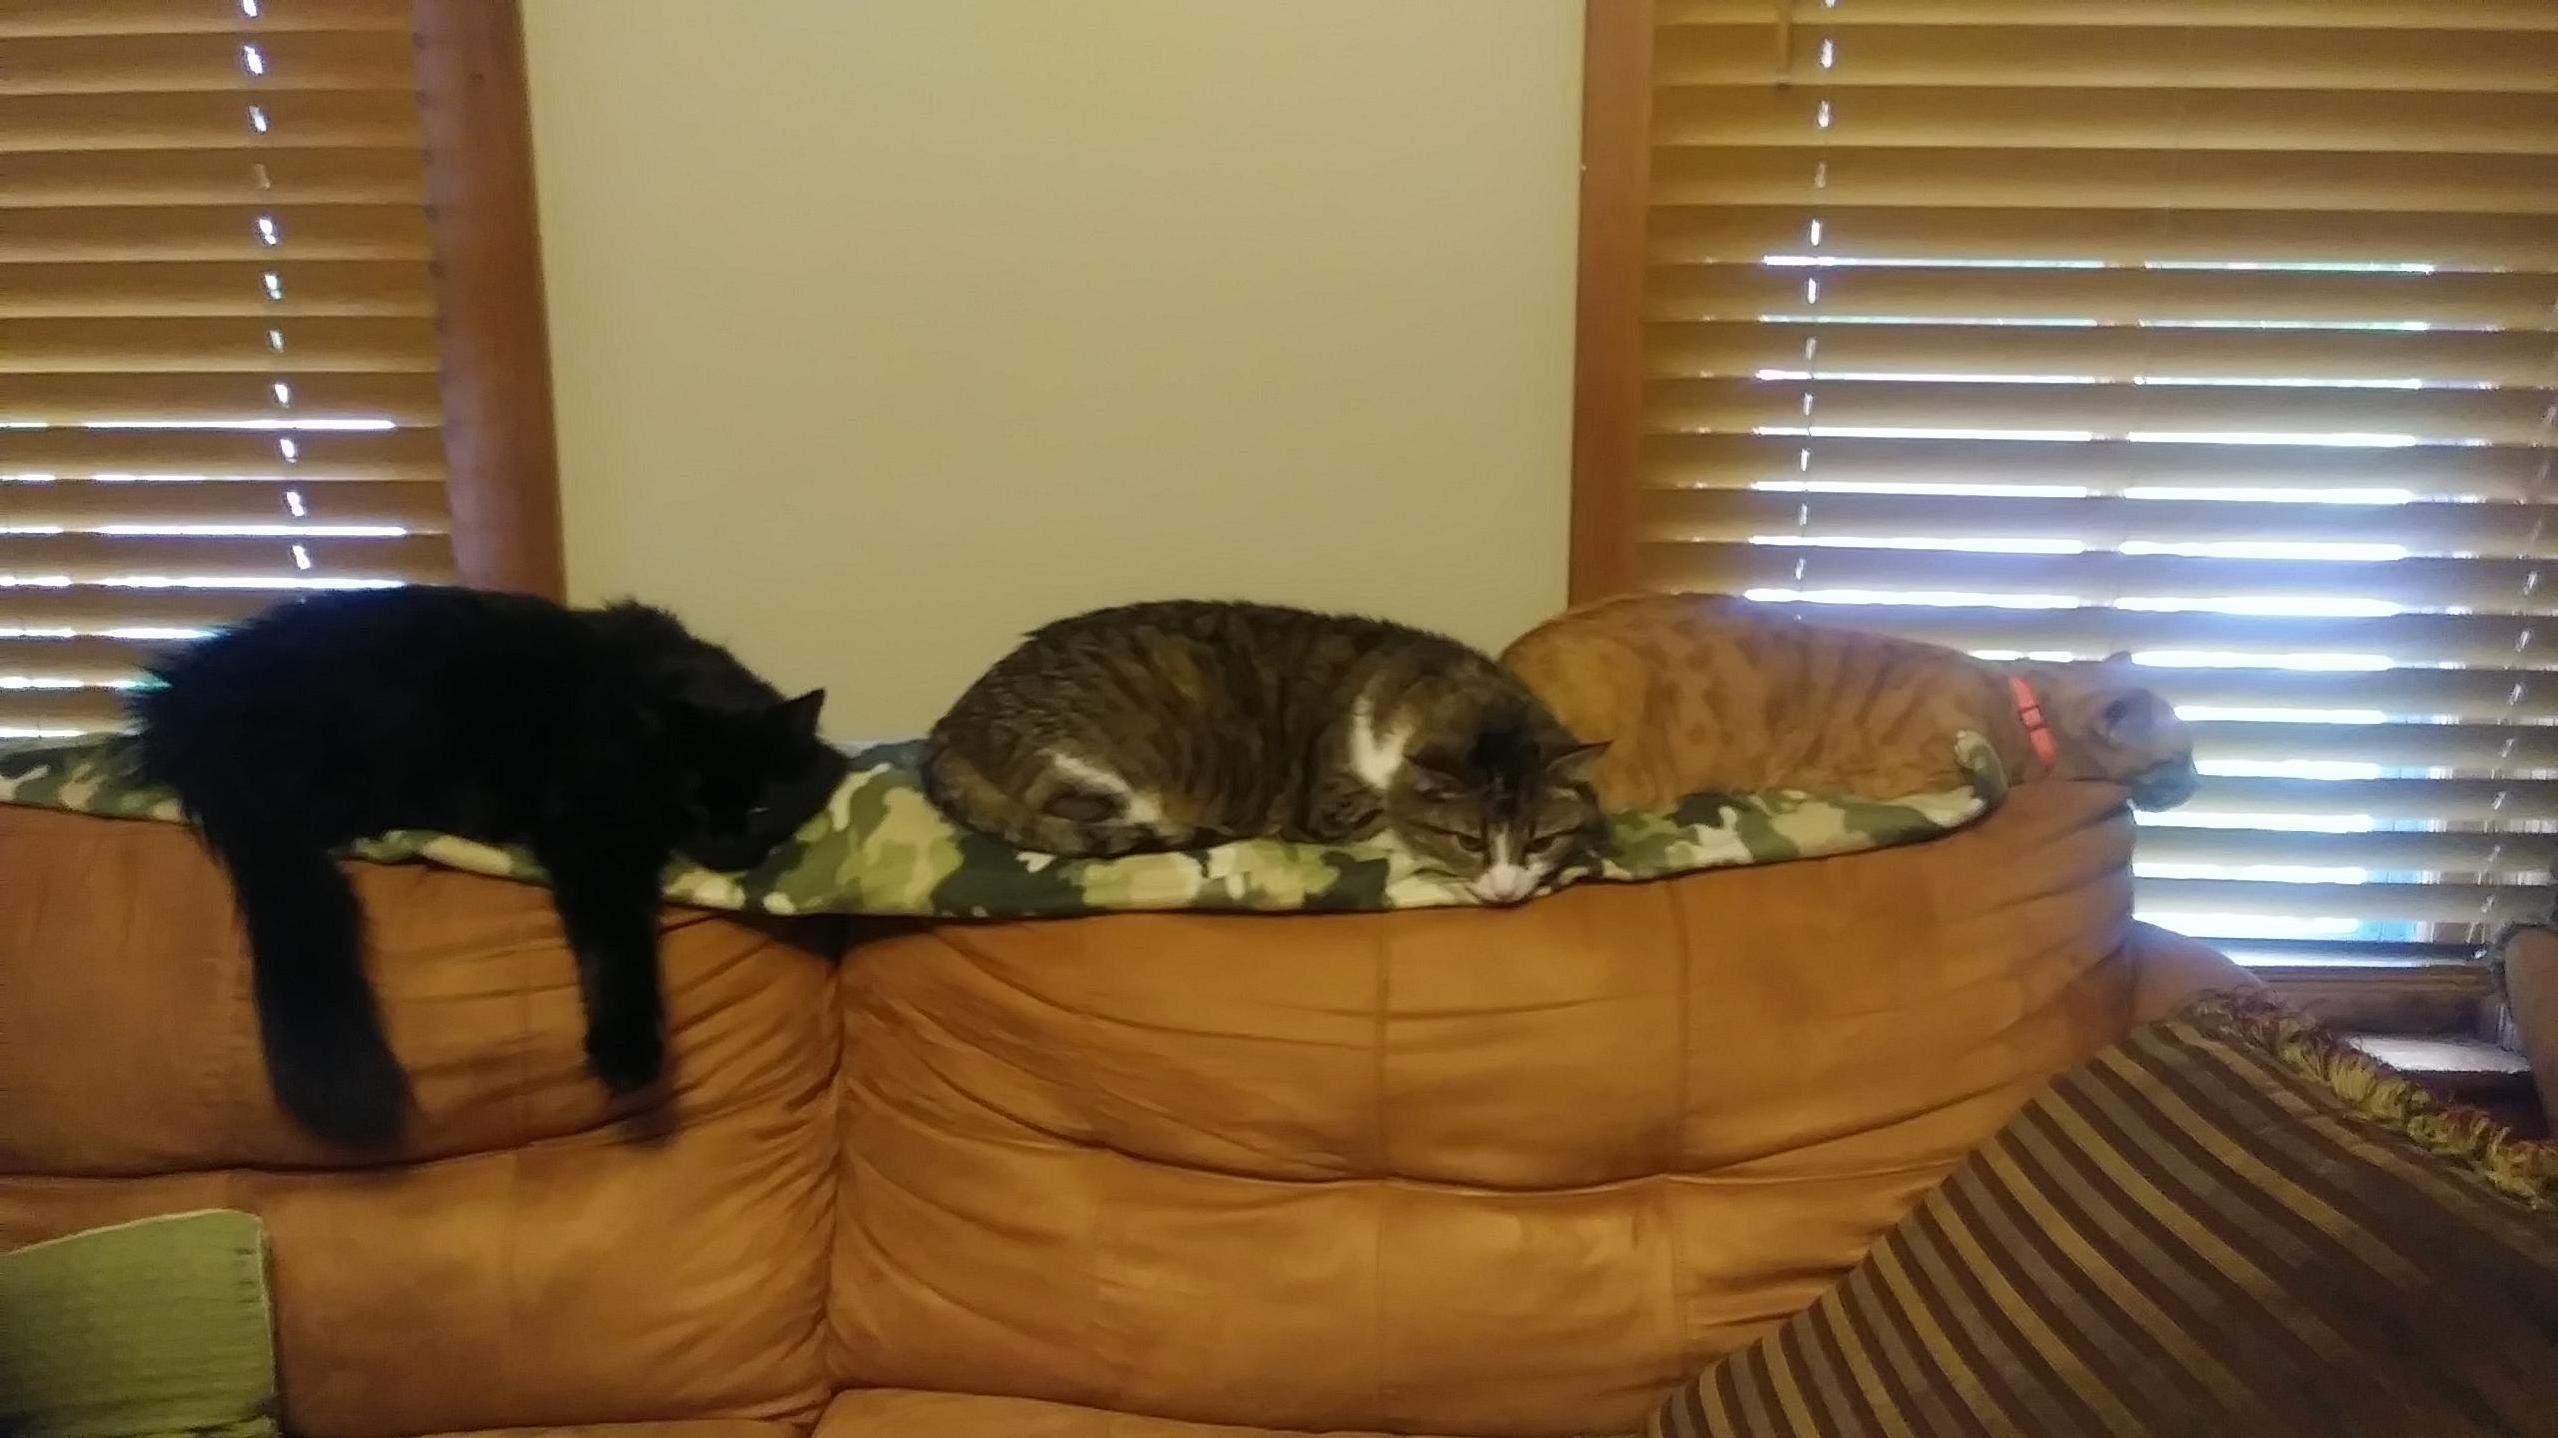 Feline catipede